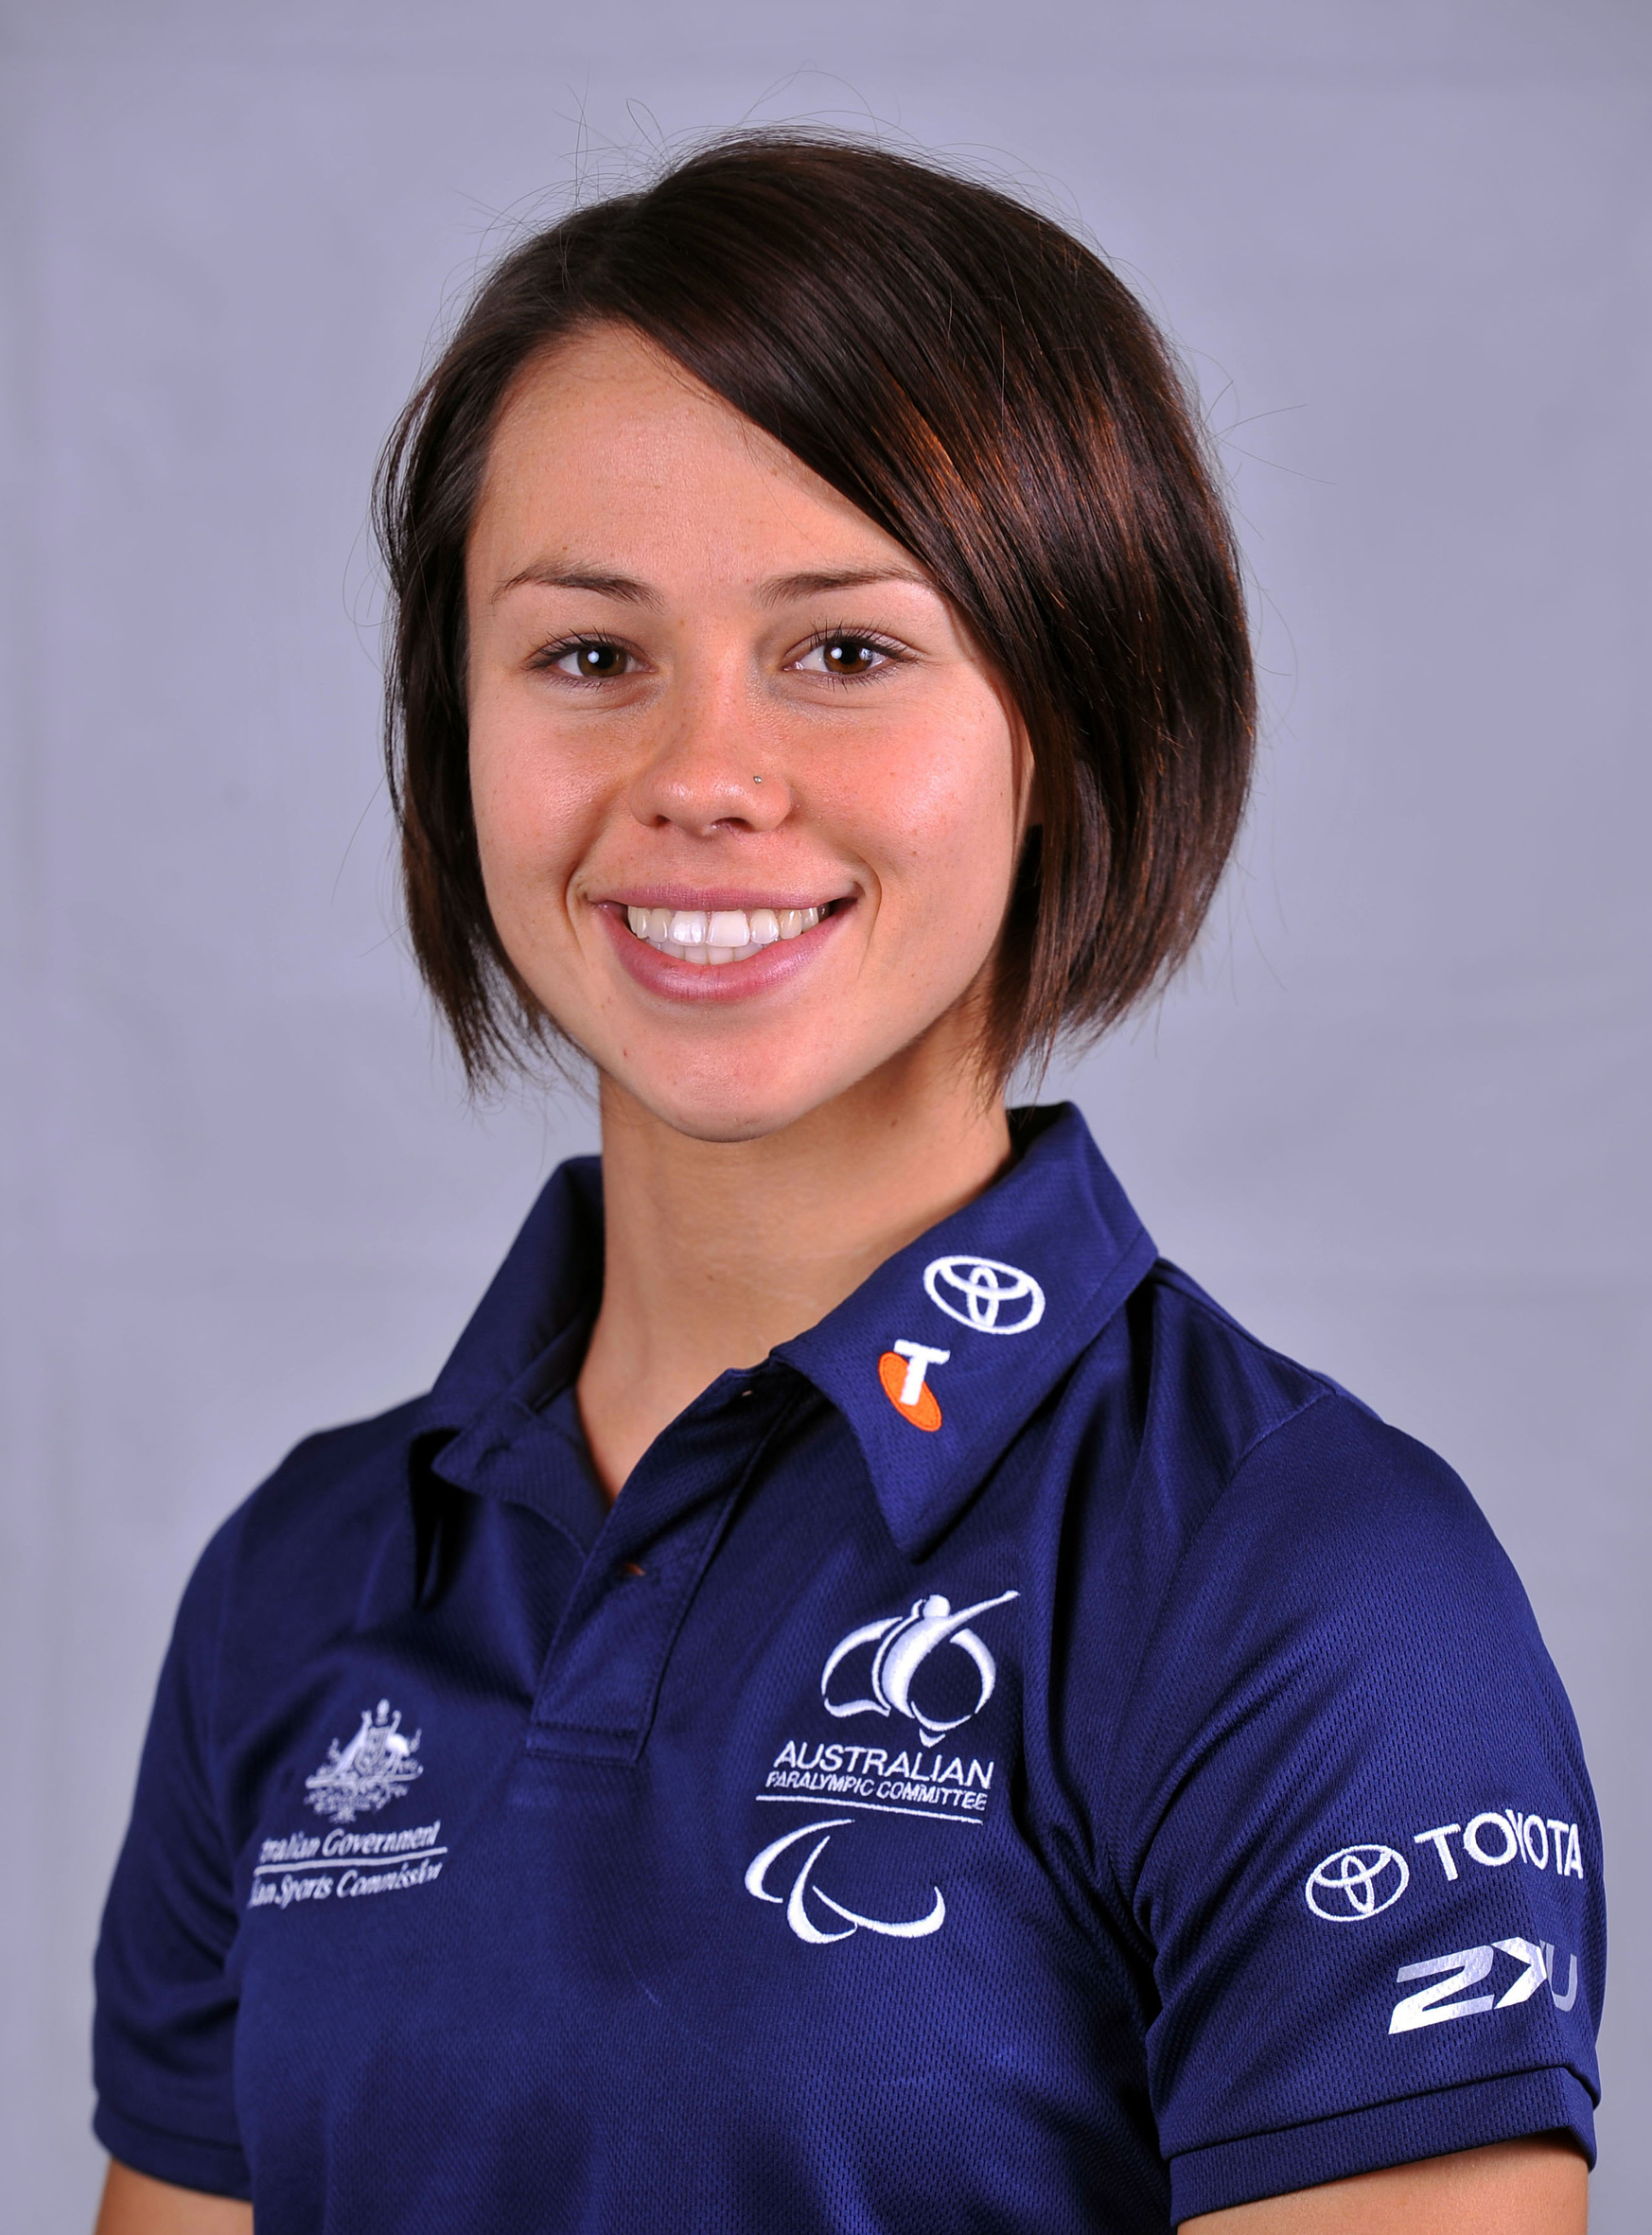 Kelly Cartwright